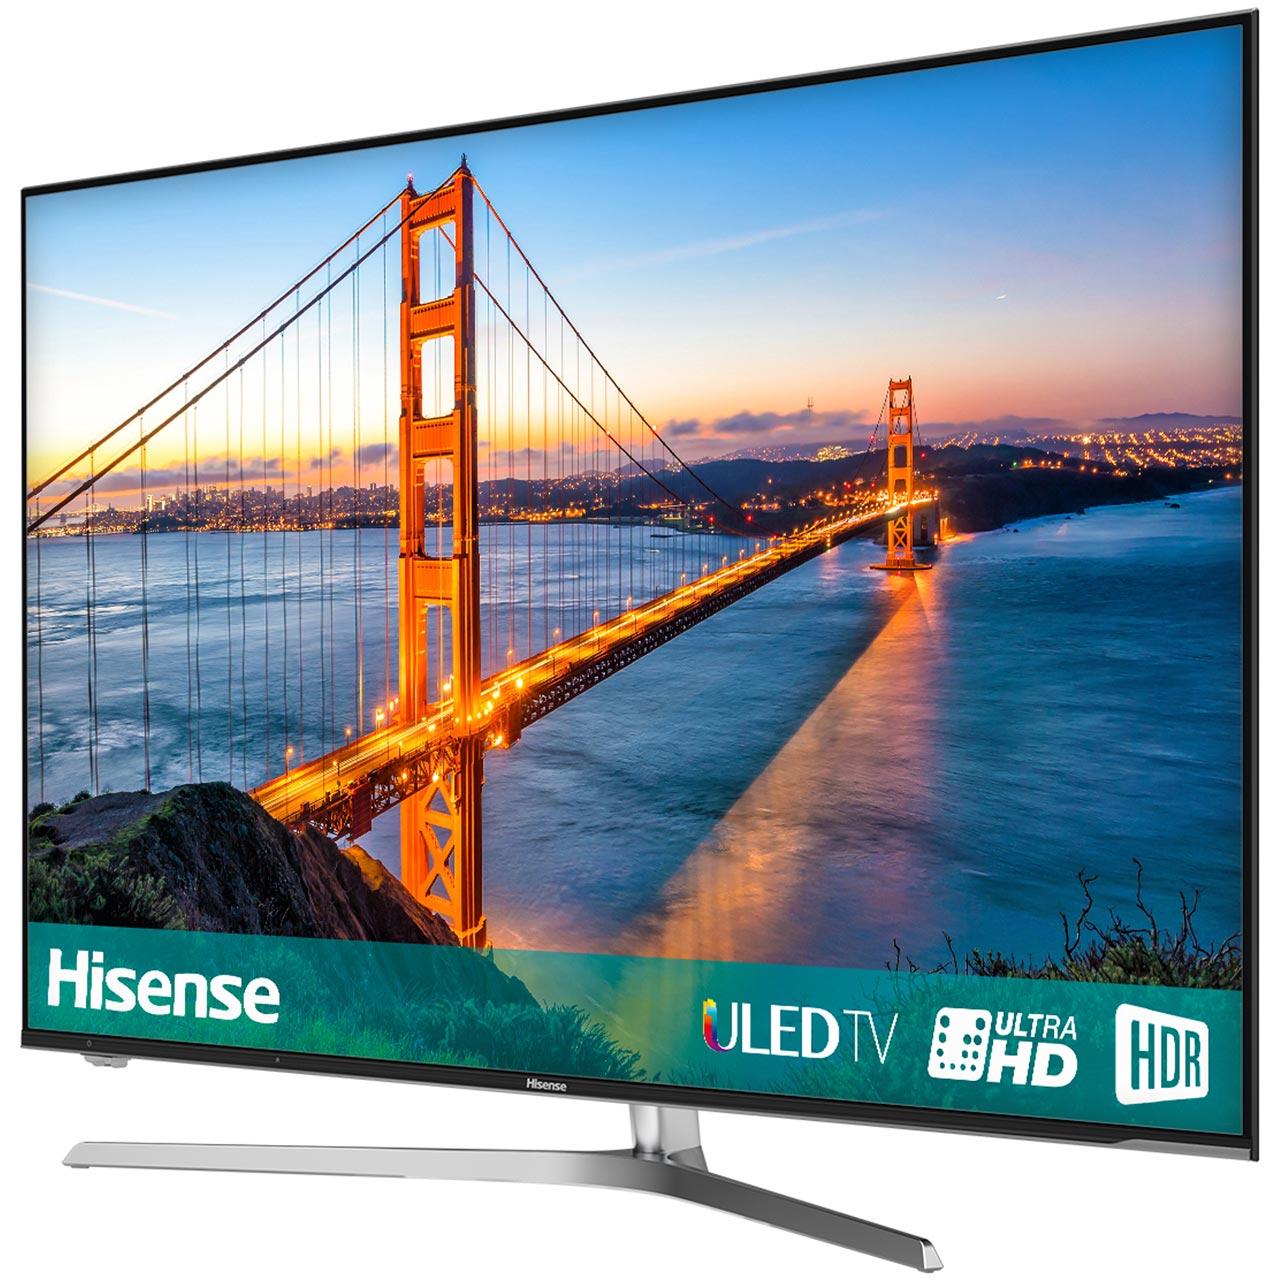 "Hisense H55U7AUK 55"" Smart 4K Ultra HD HDR ULED TV £479 @ Hisense_uk ebay"